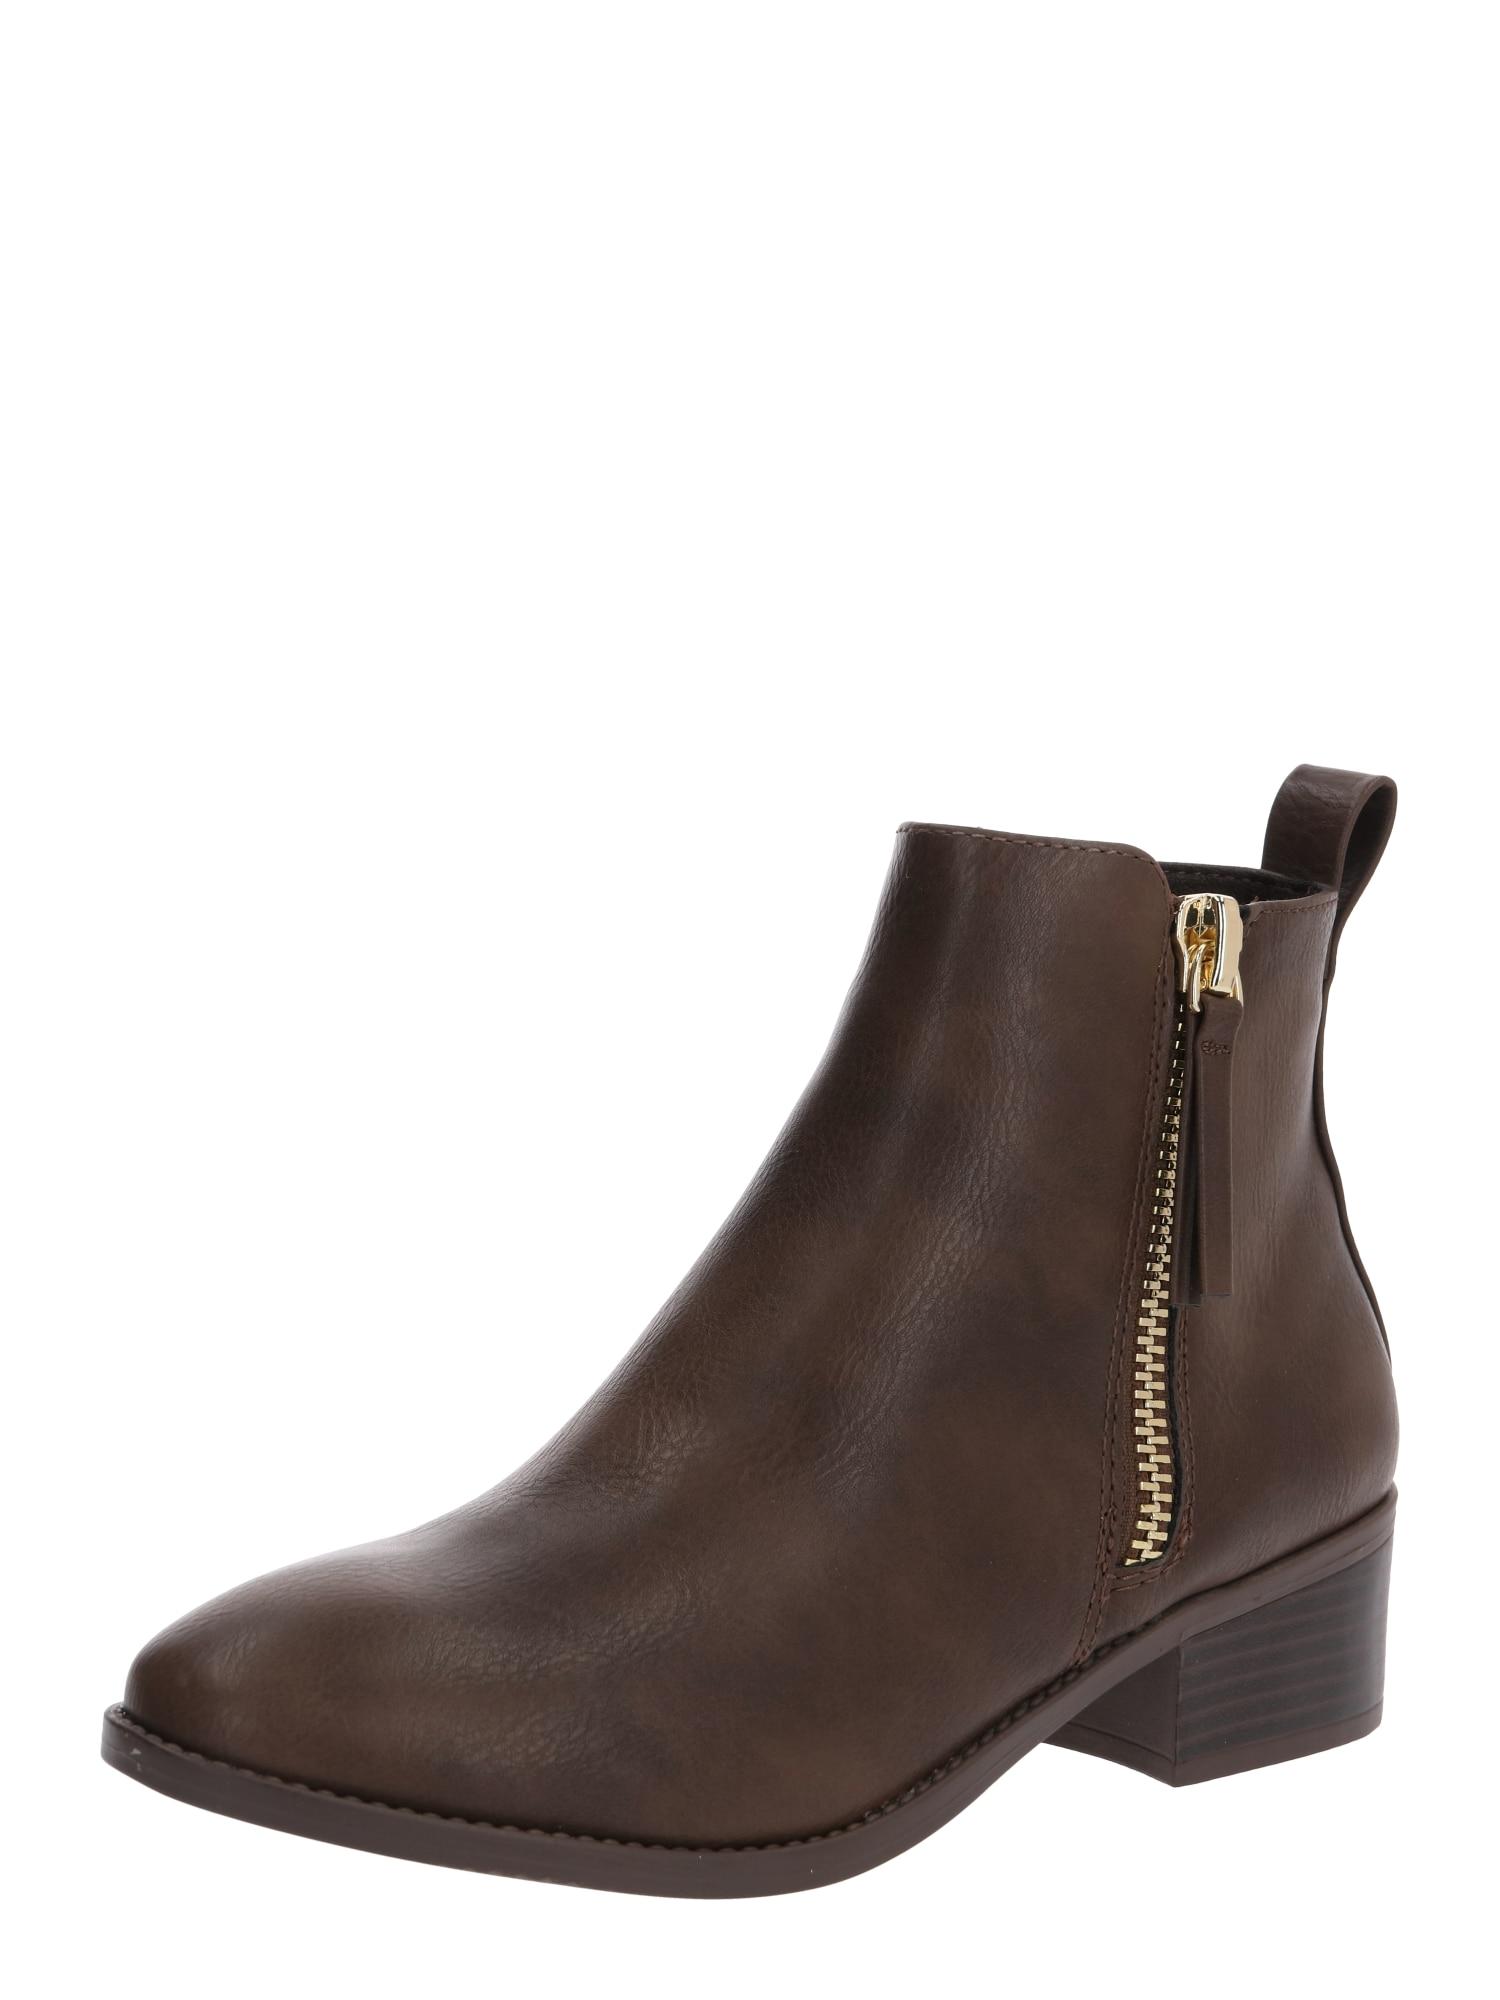 Dorothy Perkins Kulkšnis dengiantys batai